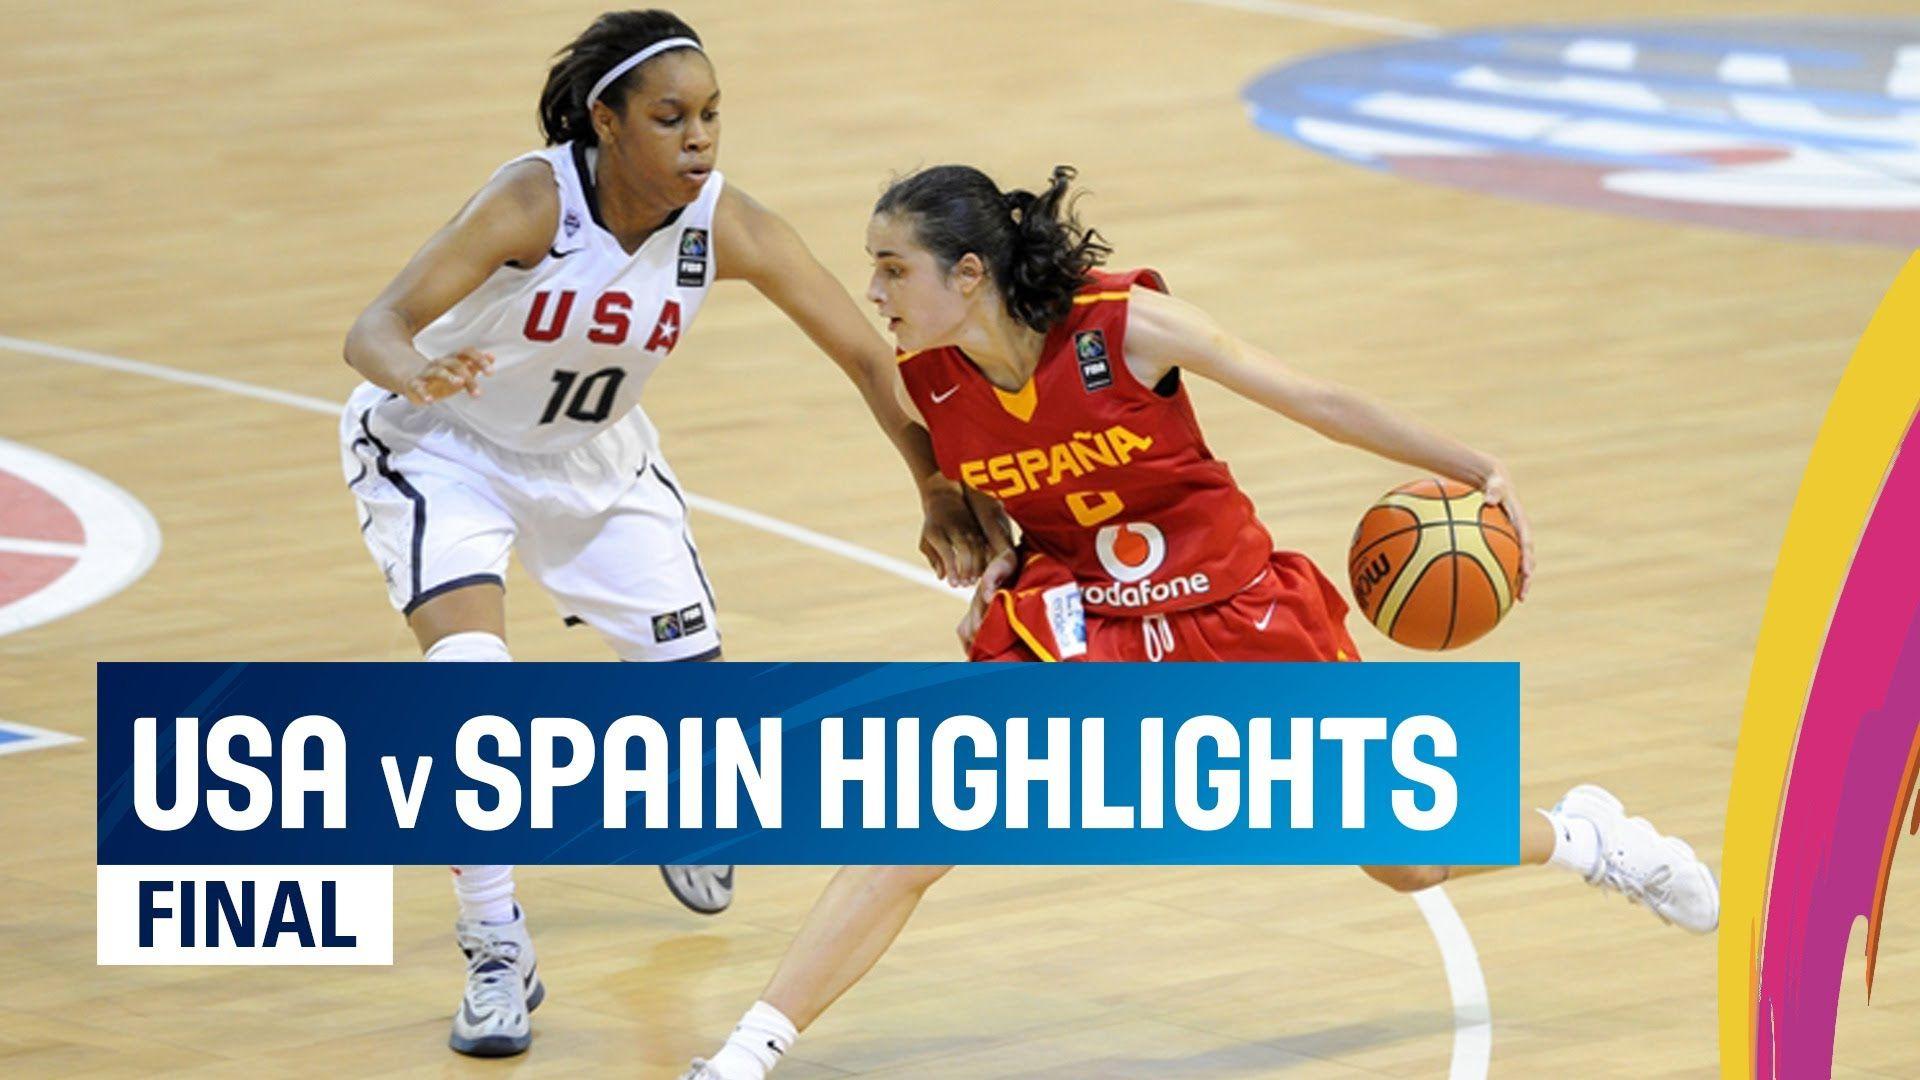 Usa V Spain Highlights Final 2014 Fiba U17 World Championship For Women World Championship Finals Highlights